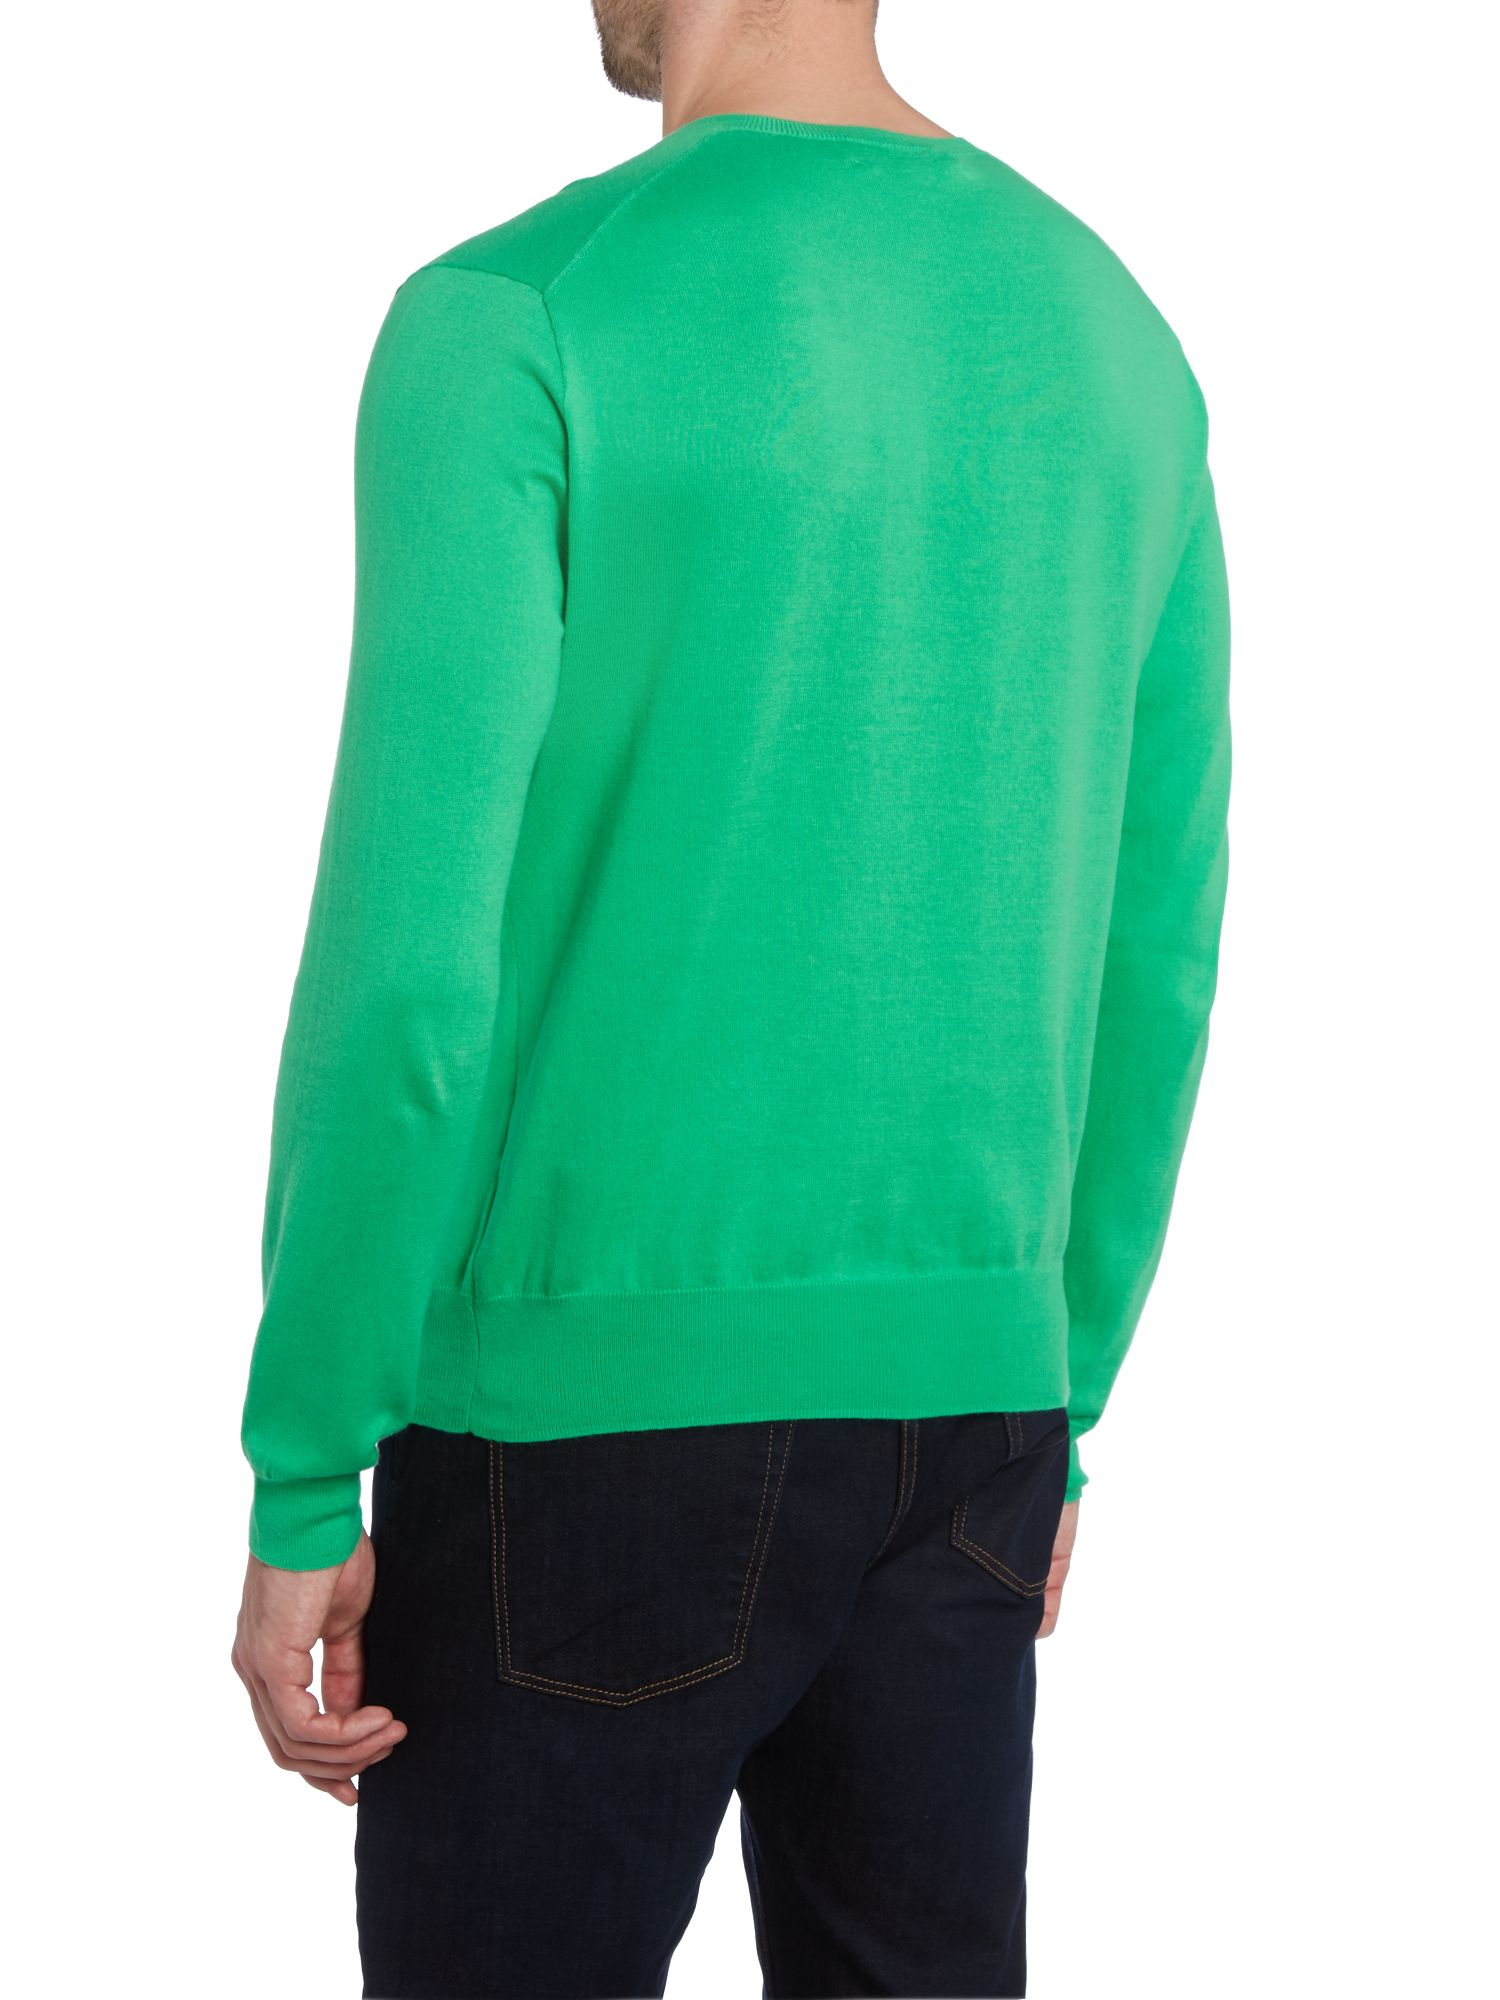 polo ralph lauren v neck slim fit pima cotton polo in green for men lyst. Black Bedroom Furniture Sets. Home Design Ideas